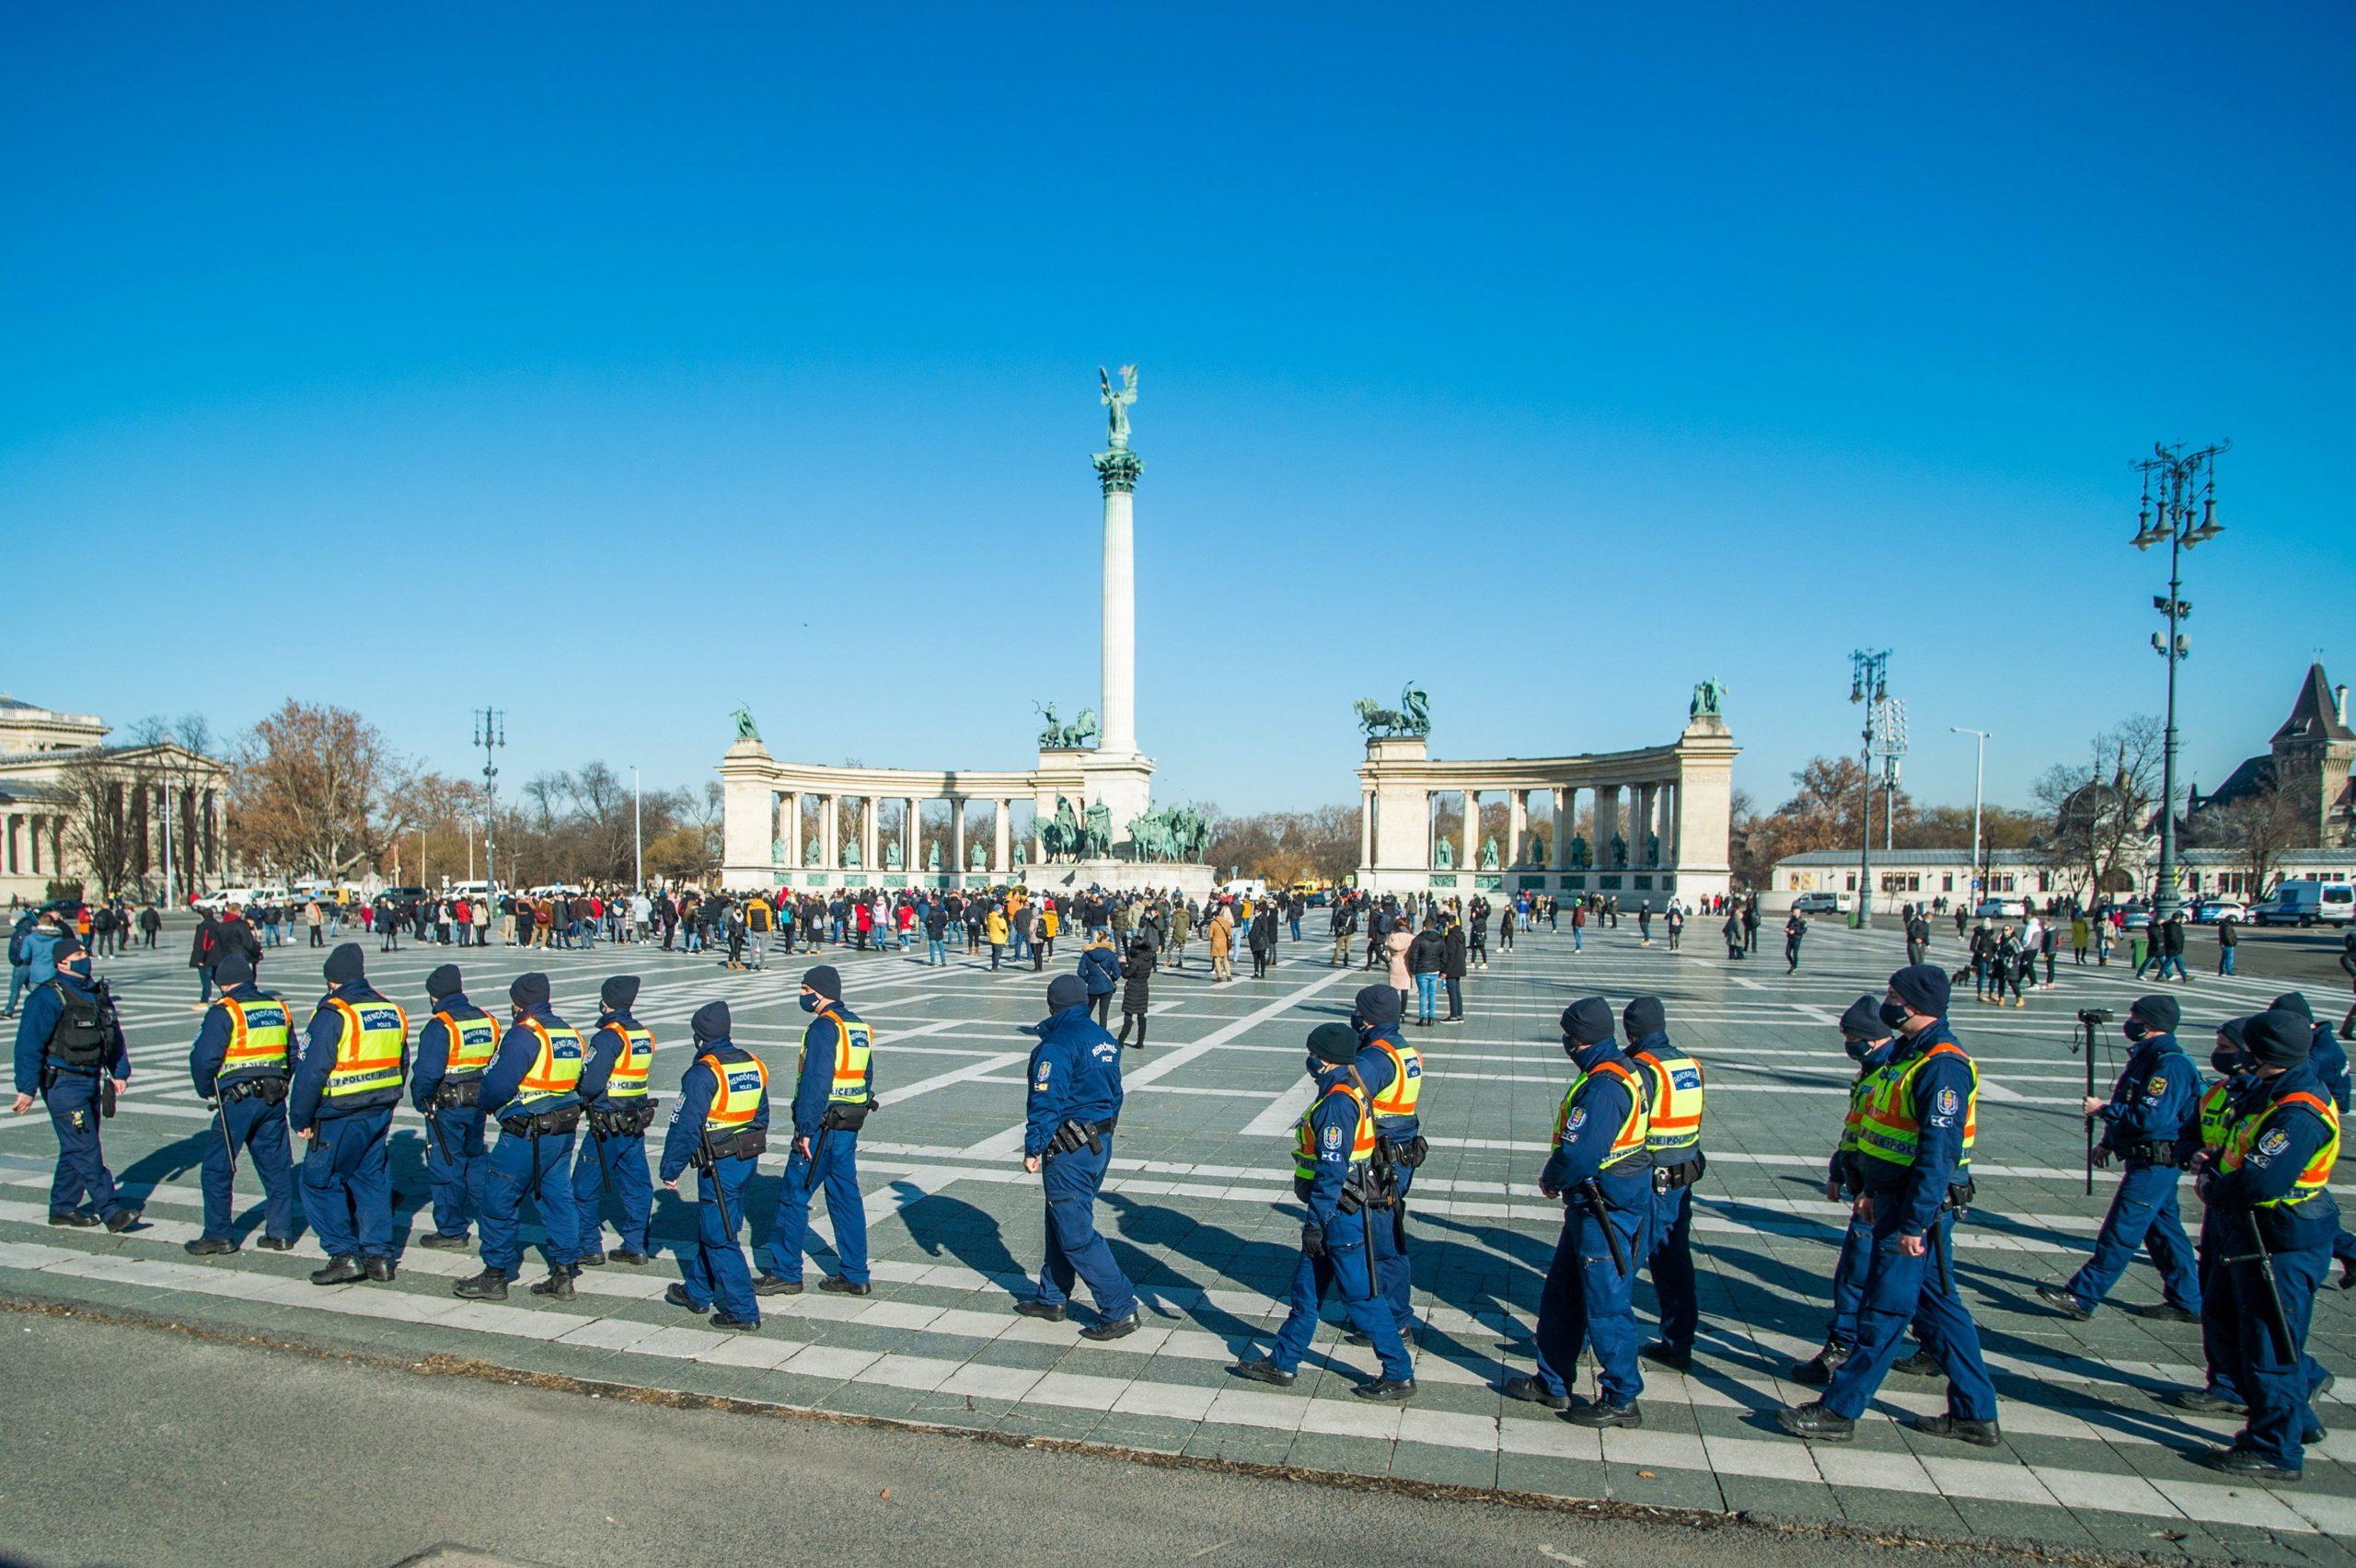 Corona-Krise: Lockdown-Gegner haben in Budapest erneut protestiert